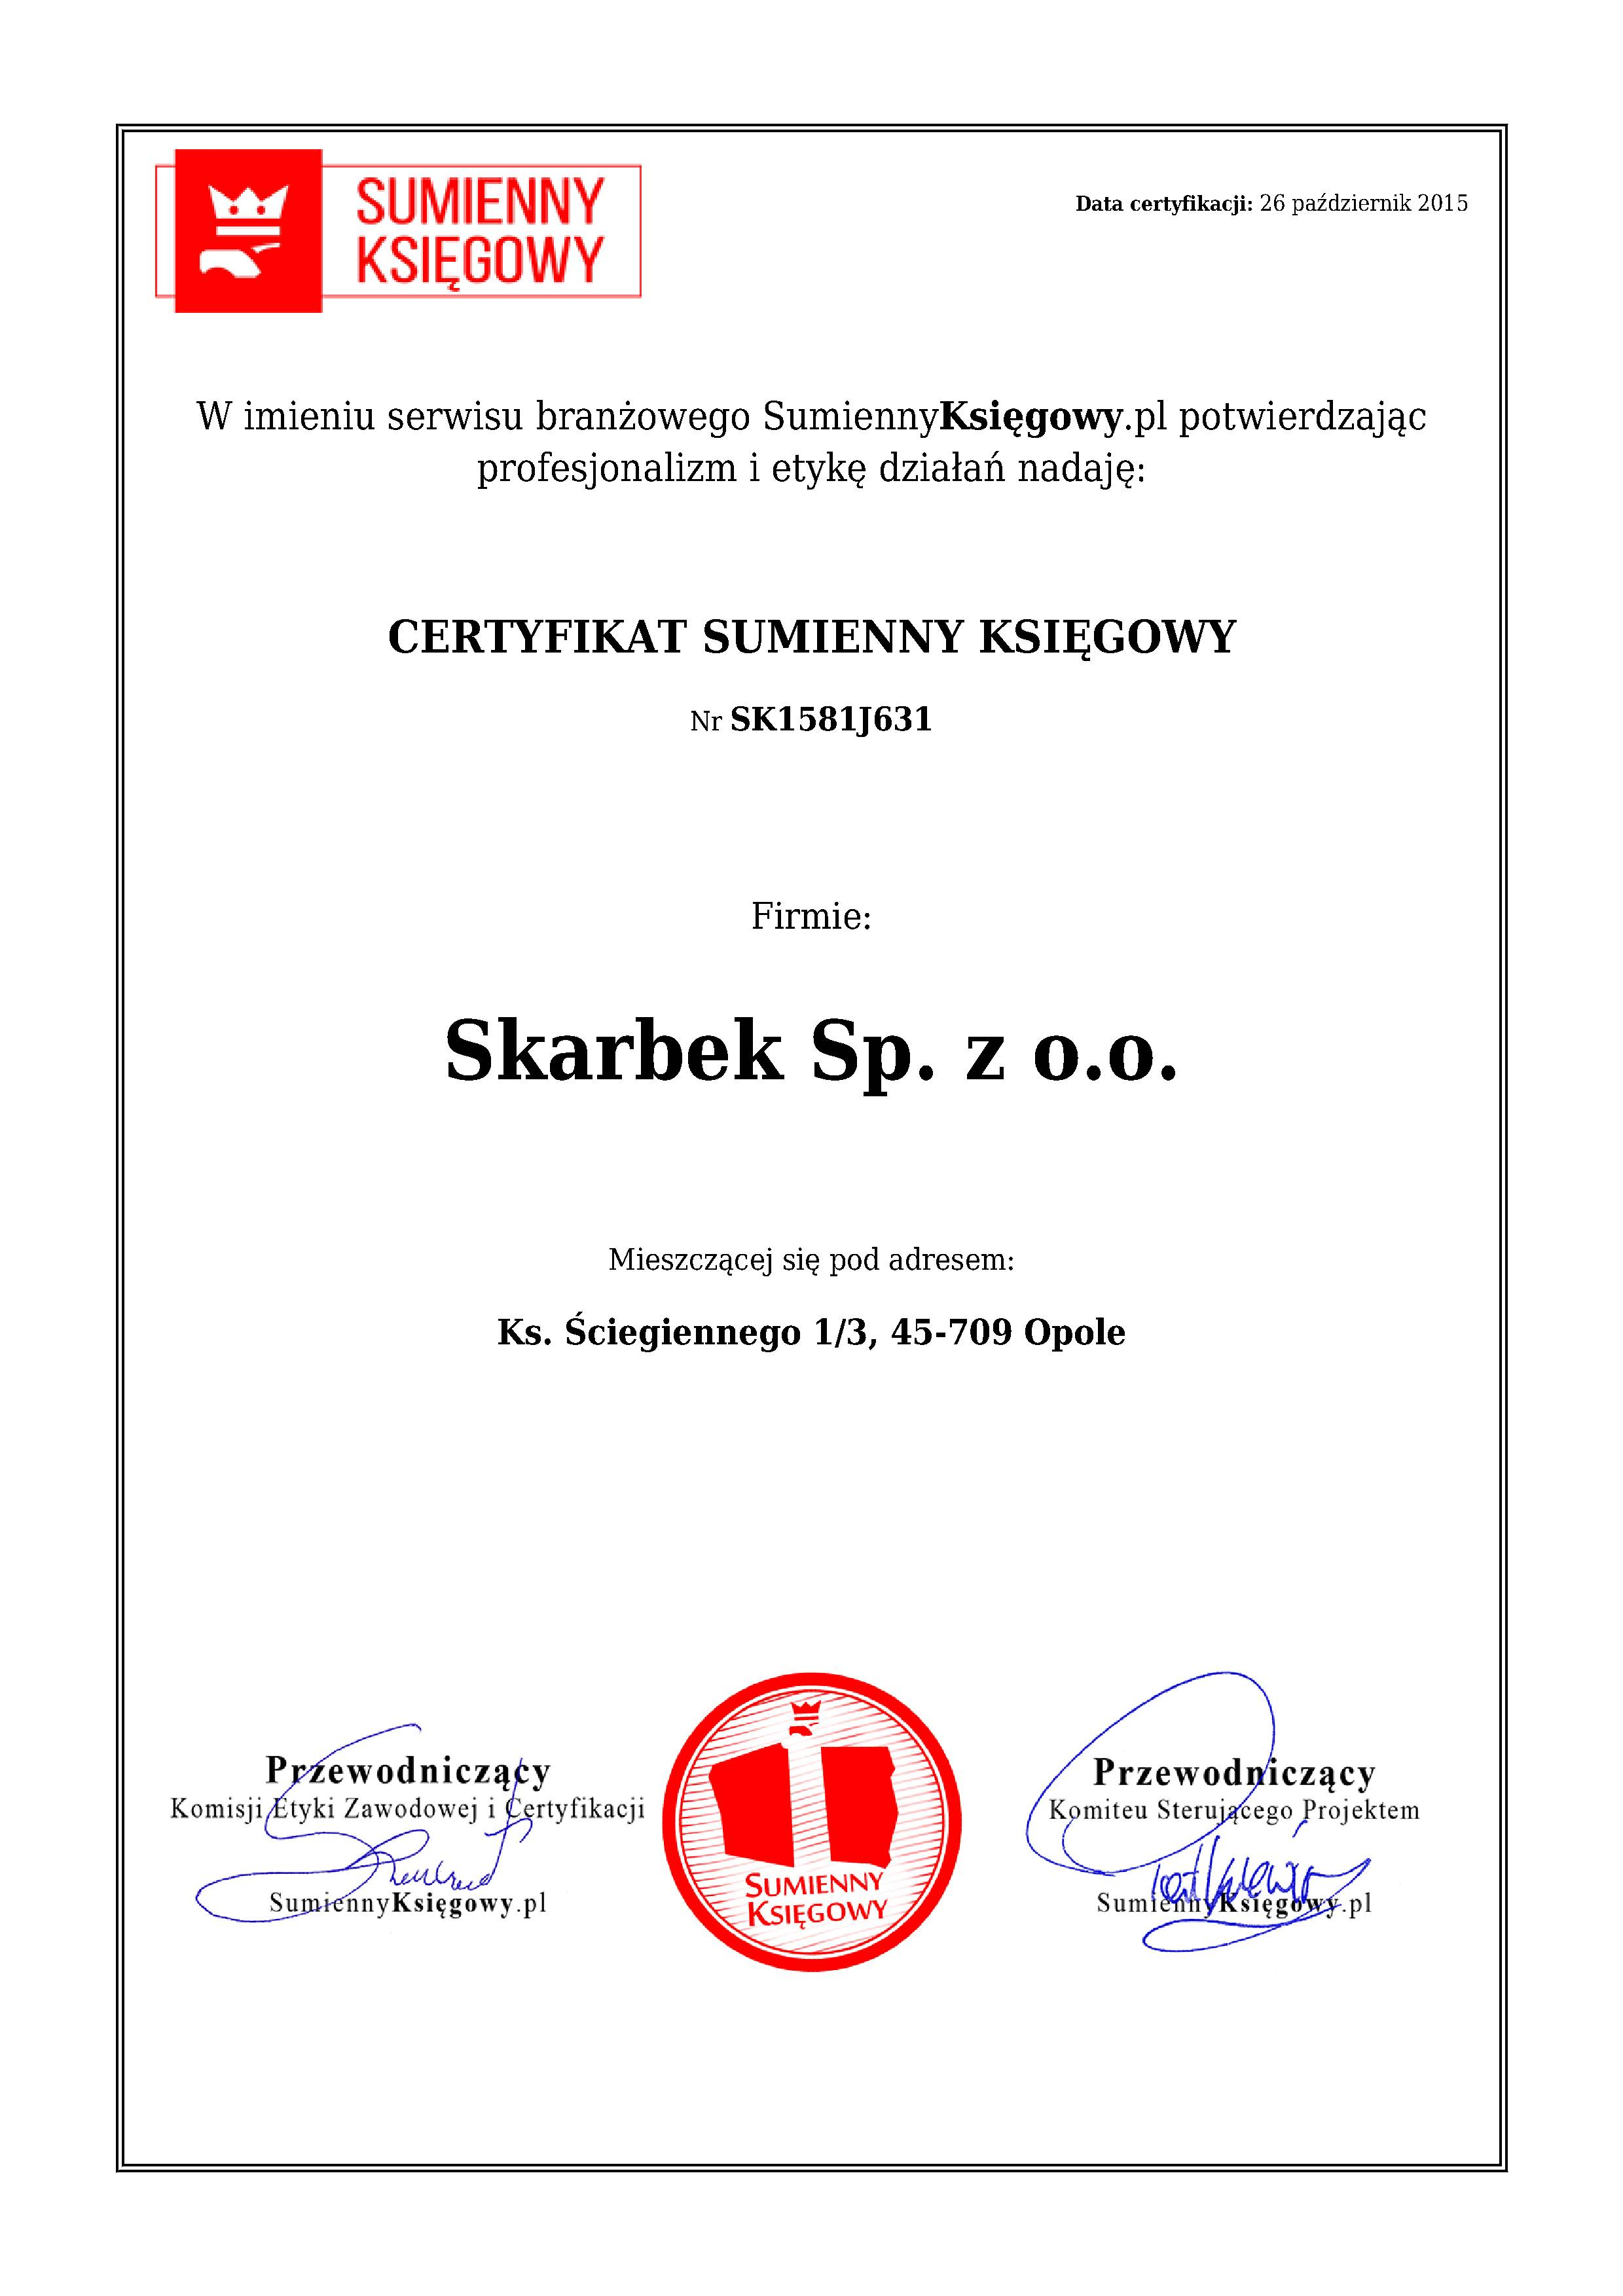 Certyfikat Skarbek Sp. z o.o.